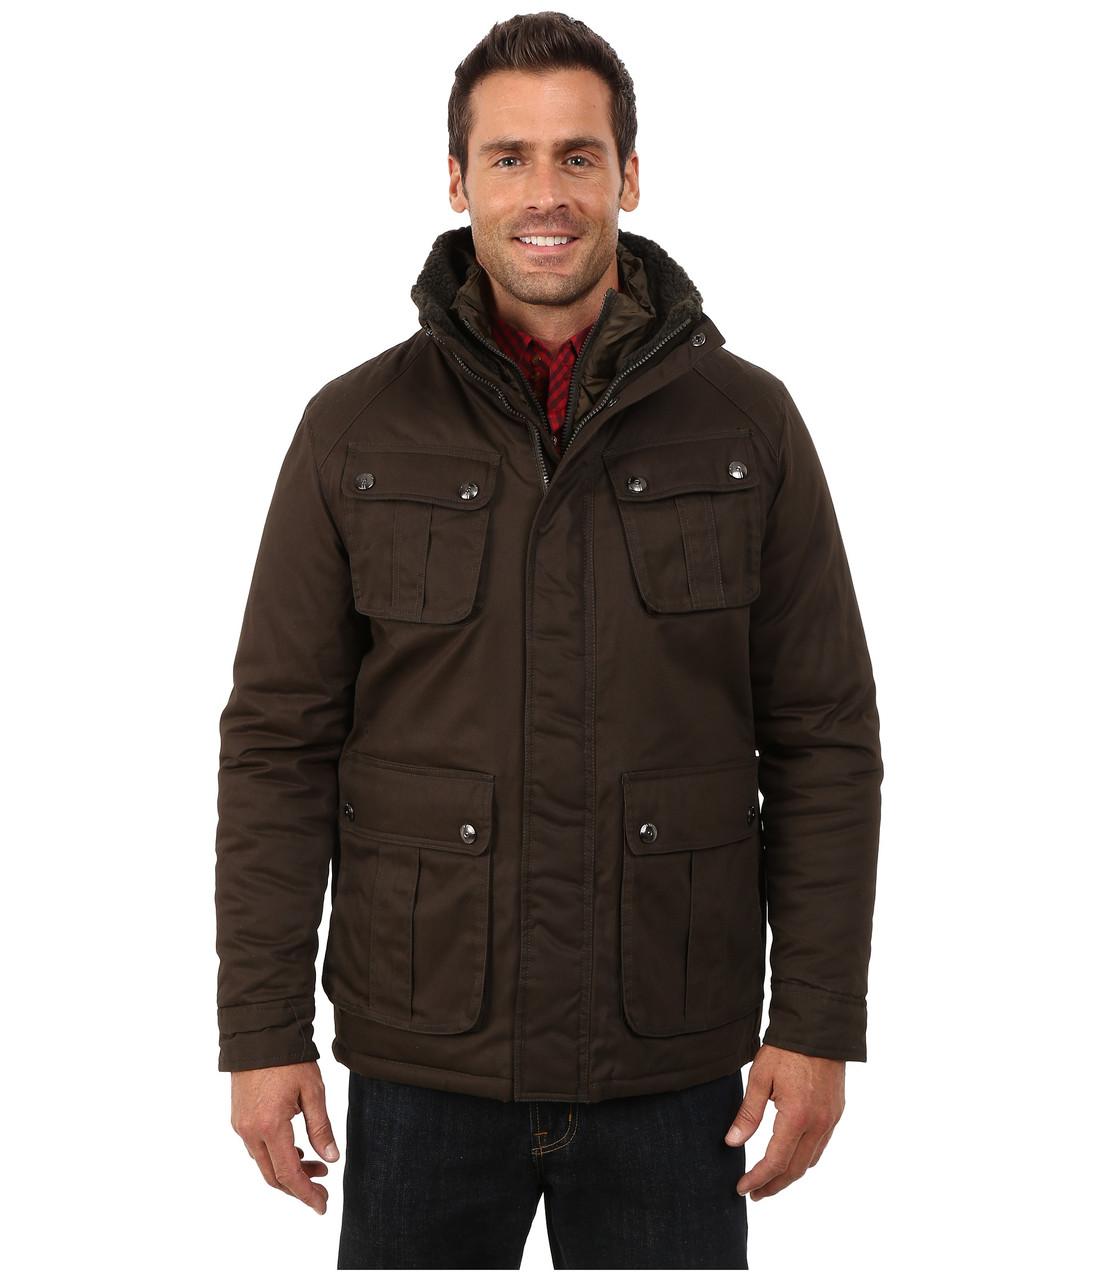 Куртка Steve Madden, S, Olive, OMA050H